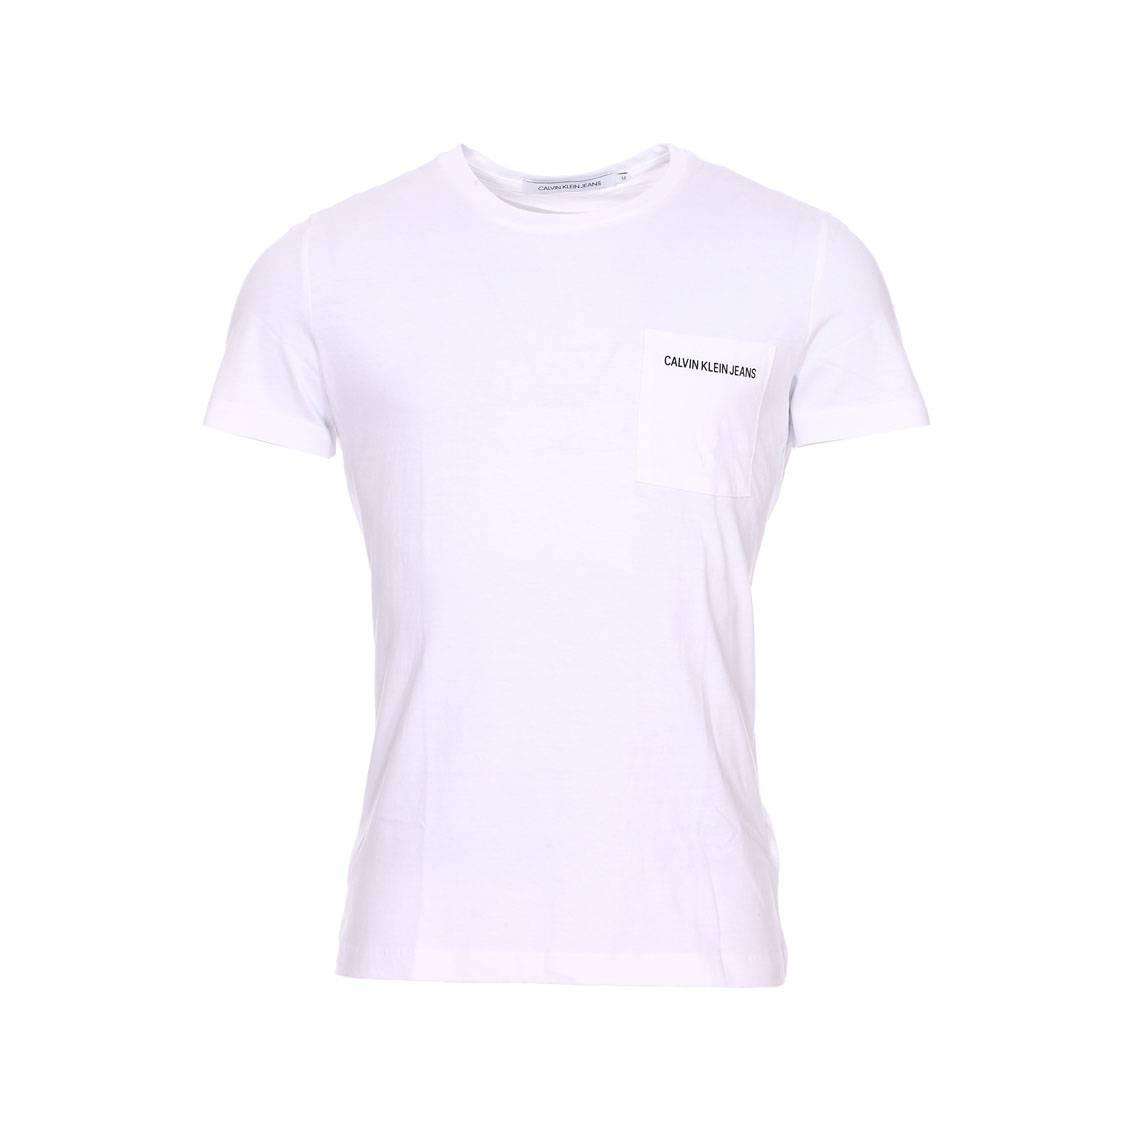 Tee-shirt col rond  pocket institutional en coton blanc à poche poitrine